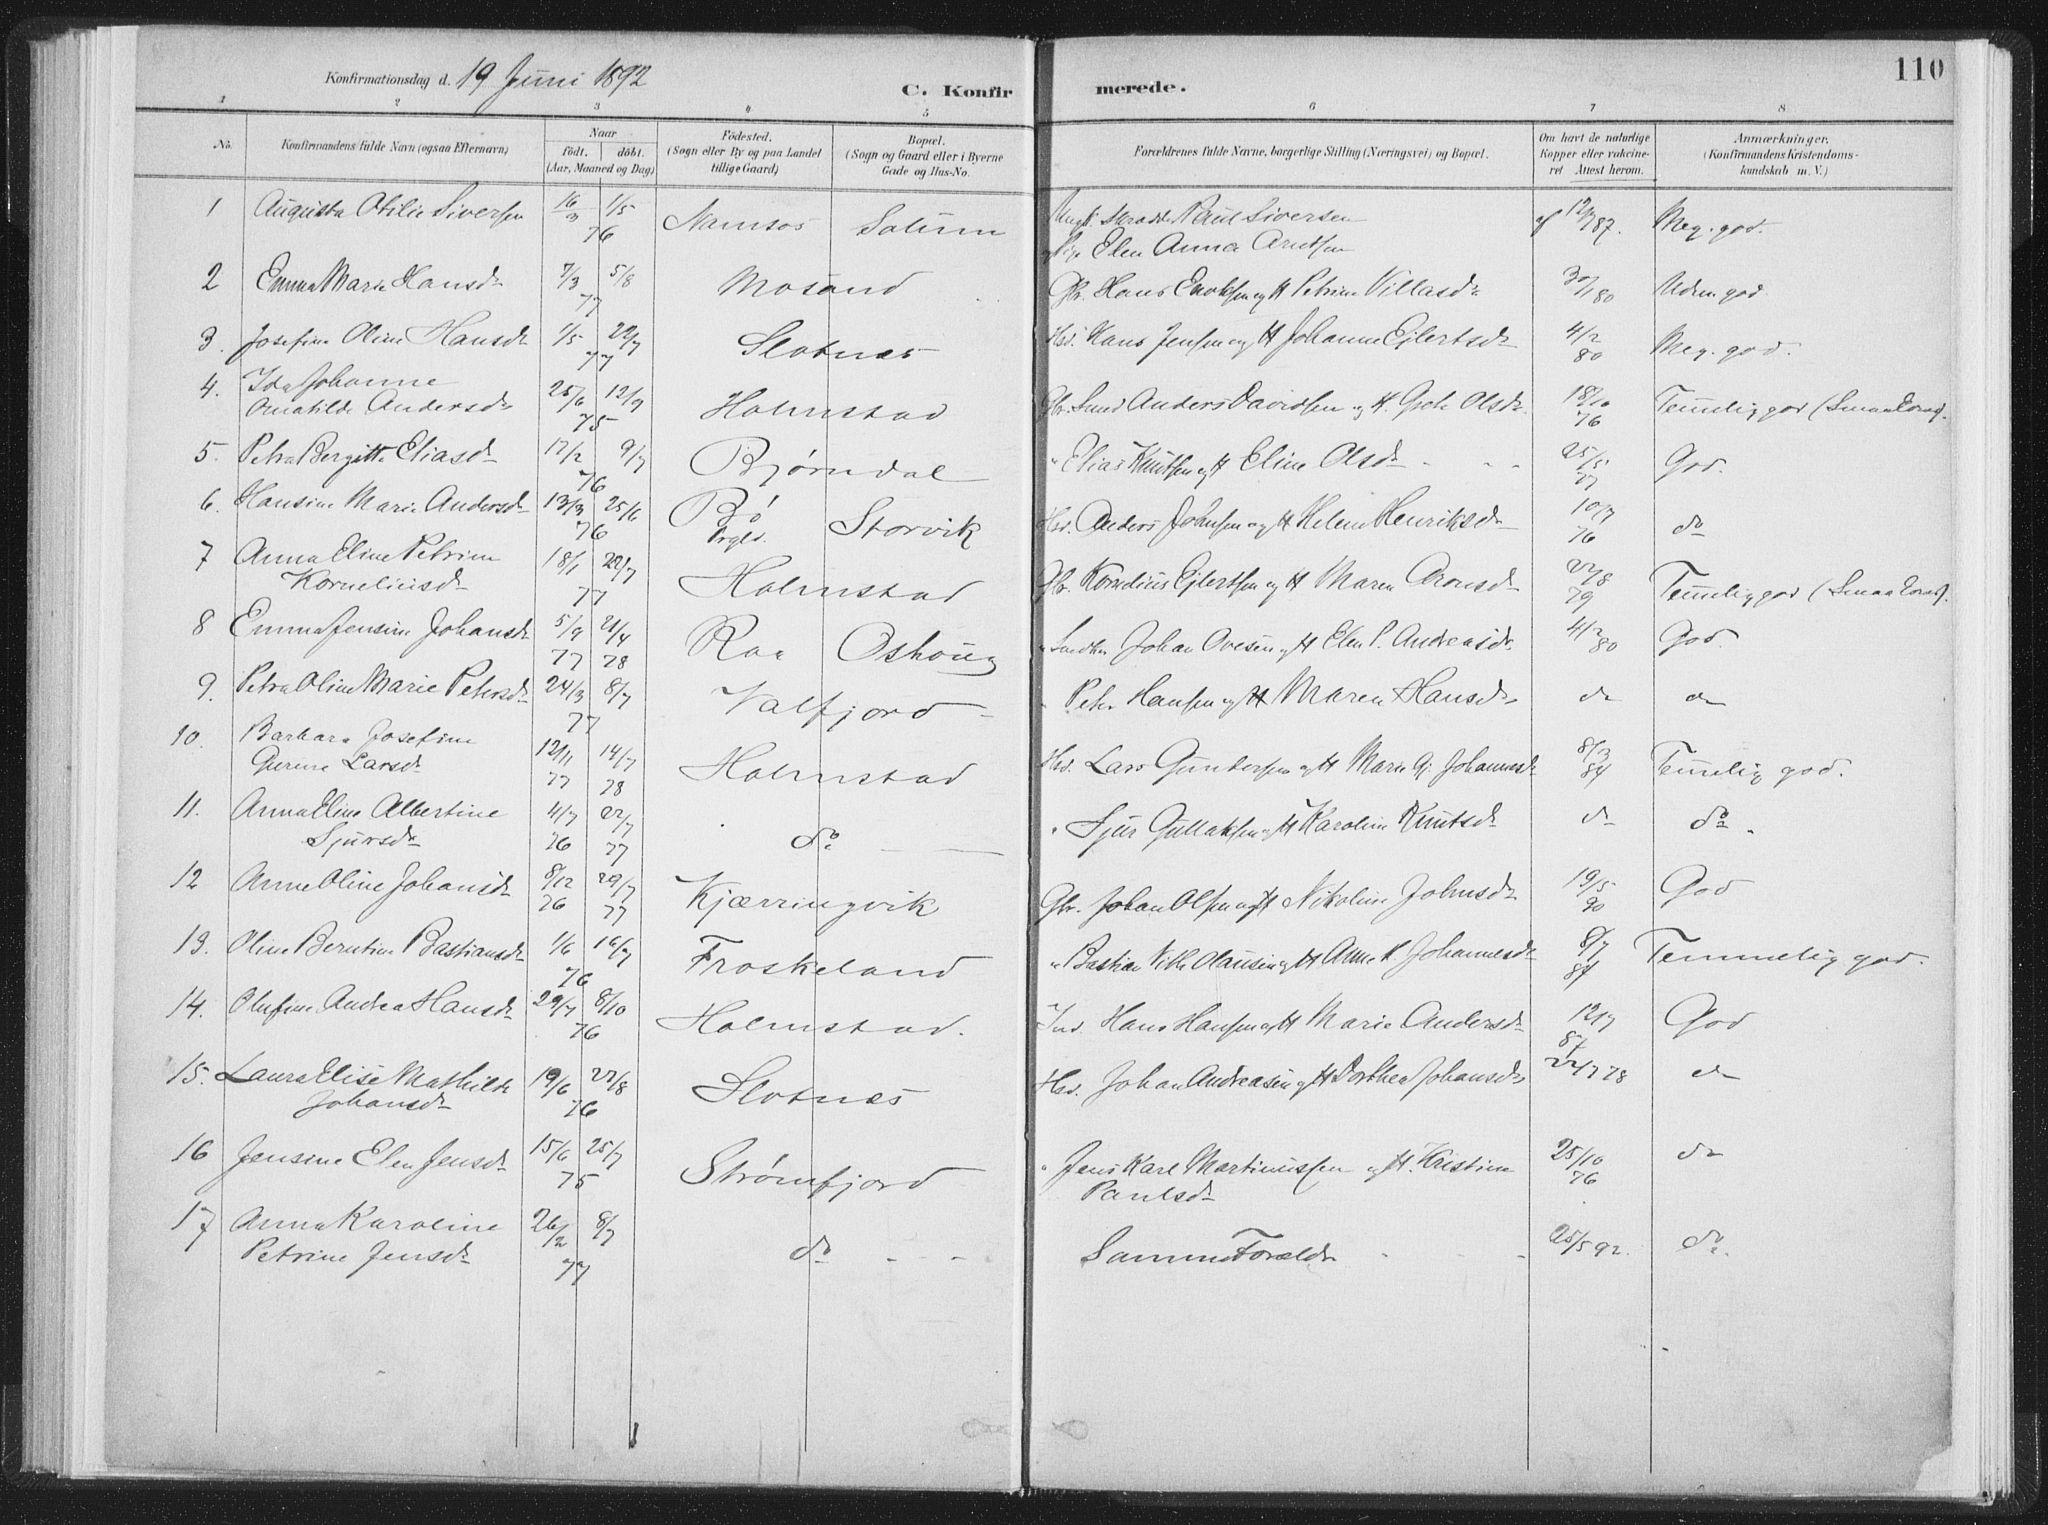 SAT, Ministerialprotokoller, klokkerbøker og fødselsregistre - Nordland, 890/L1286: Ministerialbok nr. 890A01, 1882-1902, s. 110